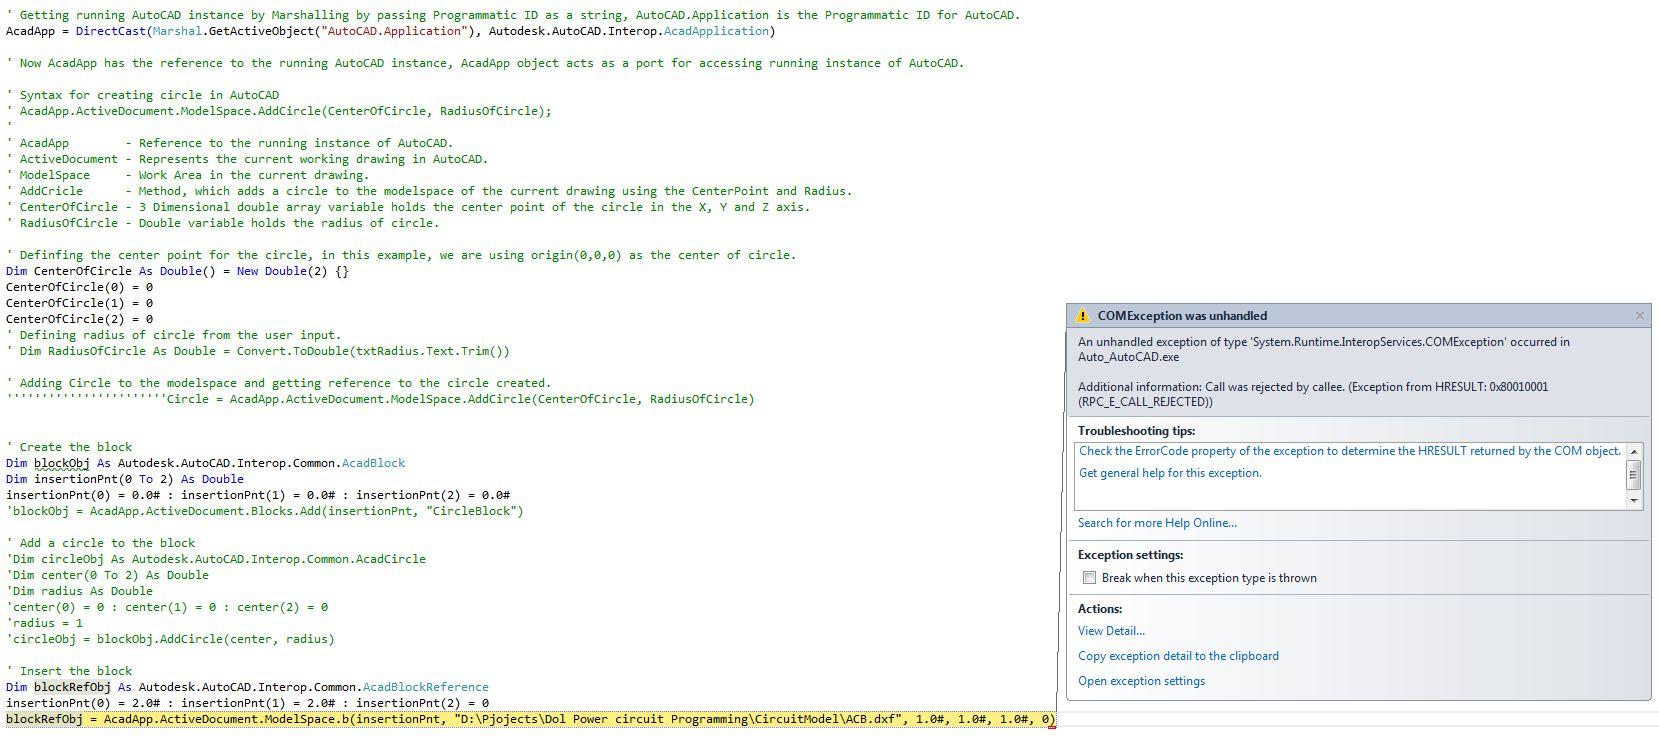 Vb net Autocad Insert Block From File - aspawurl's blog